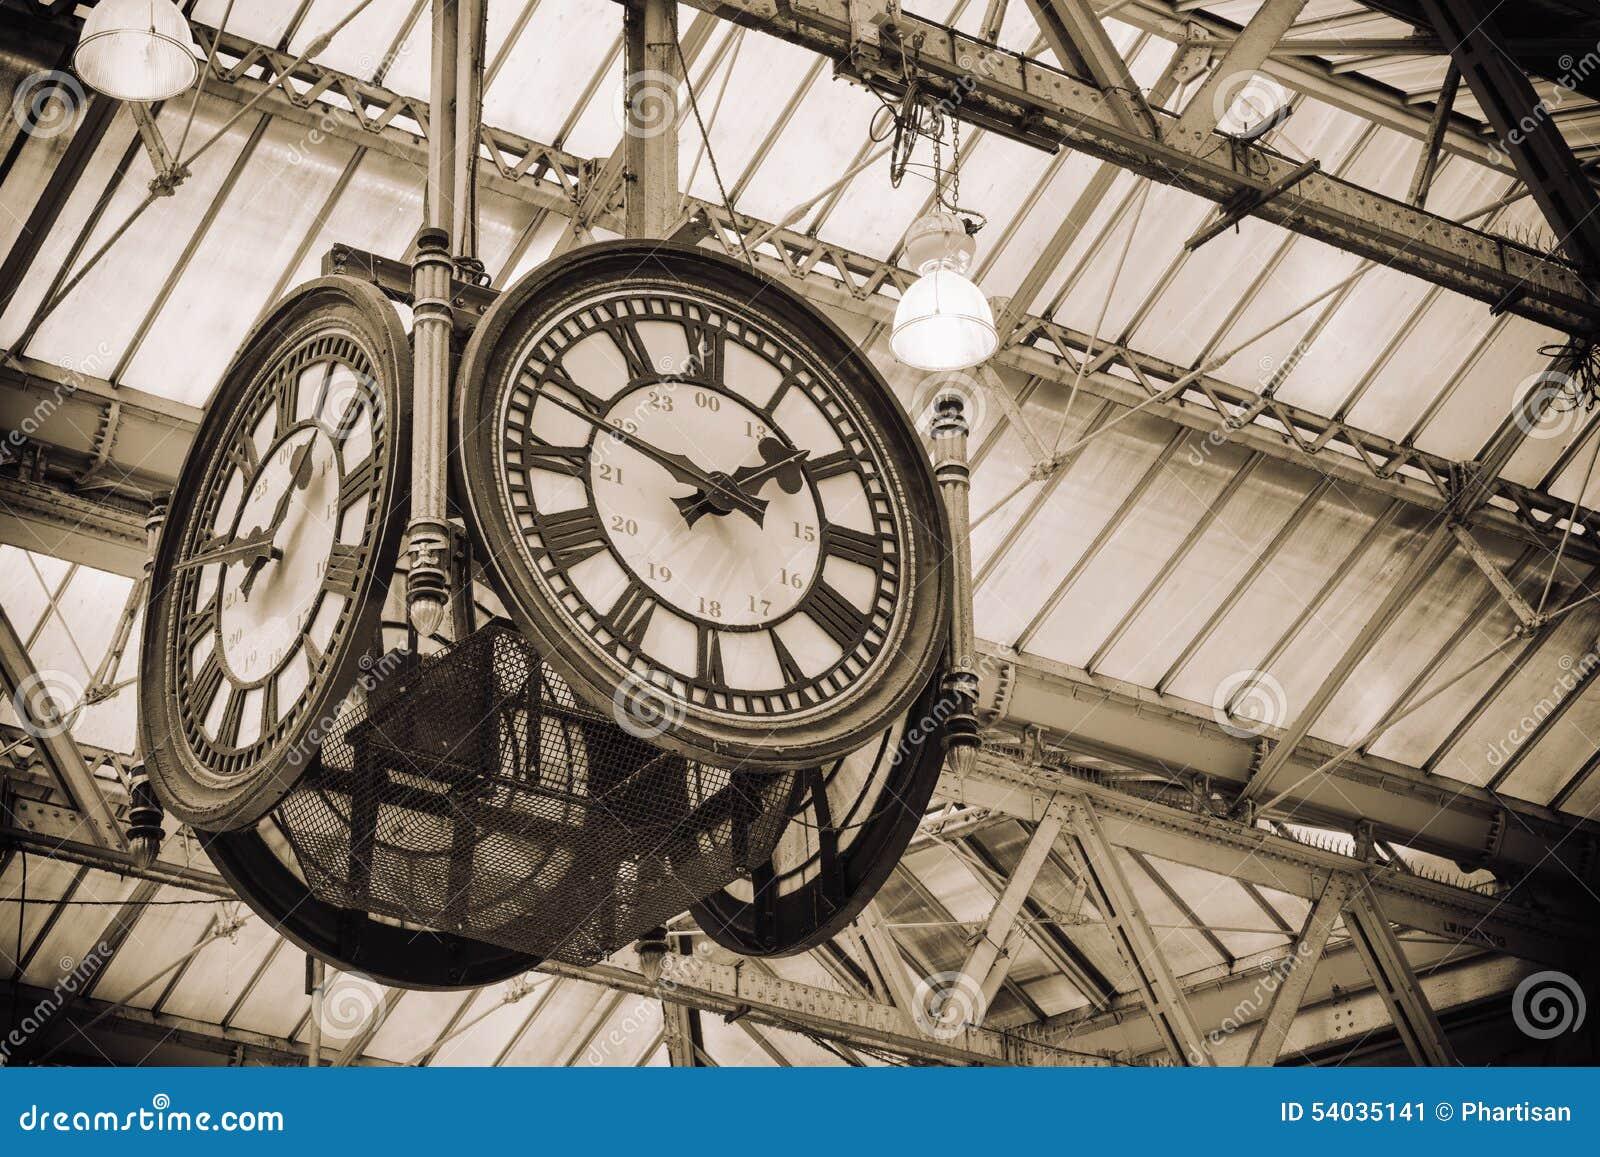 Antike uhr wallpaper  Ikonenhafte Alte Uhr Waterloo-Station, London Stockfoto - Bild ...